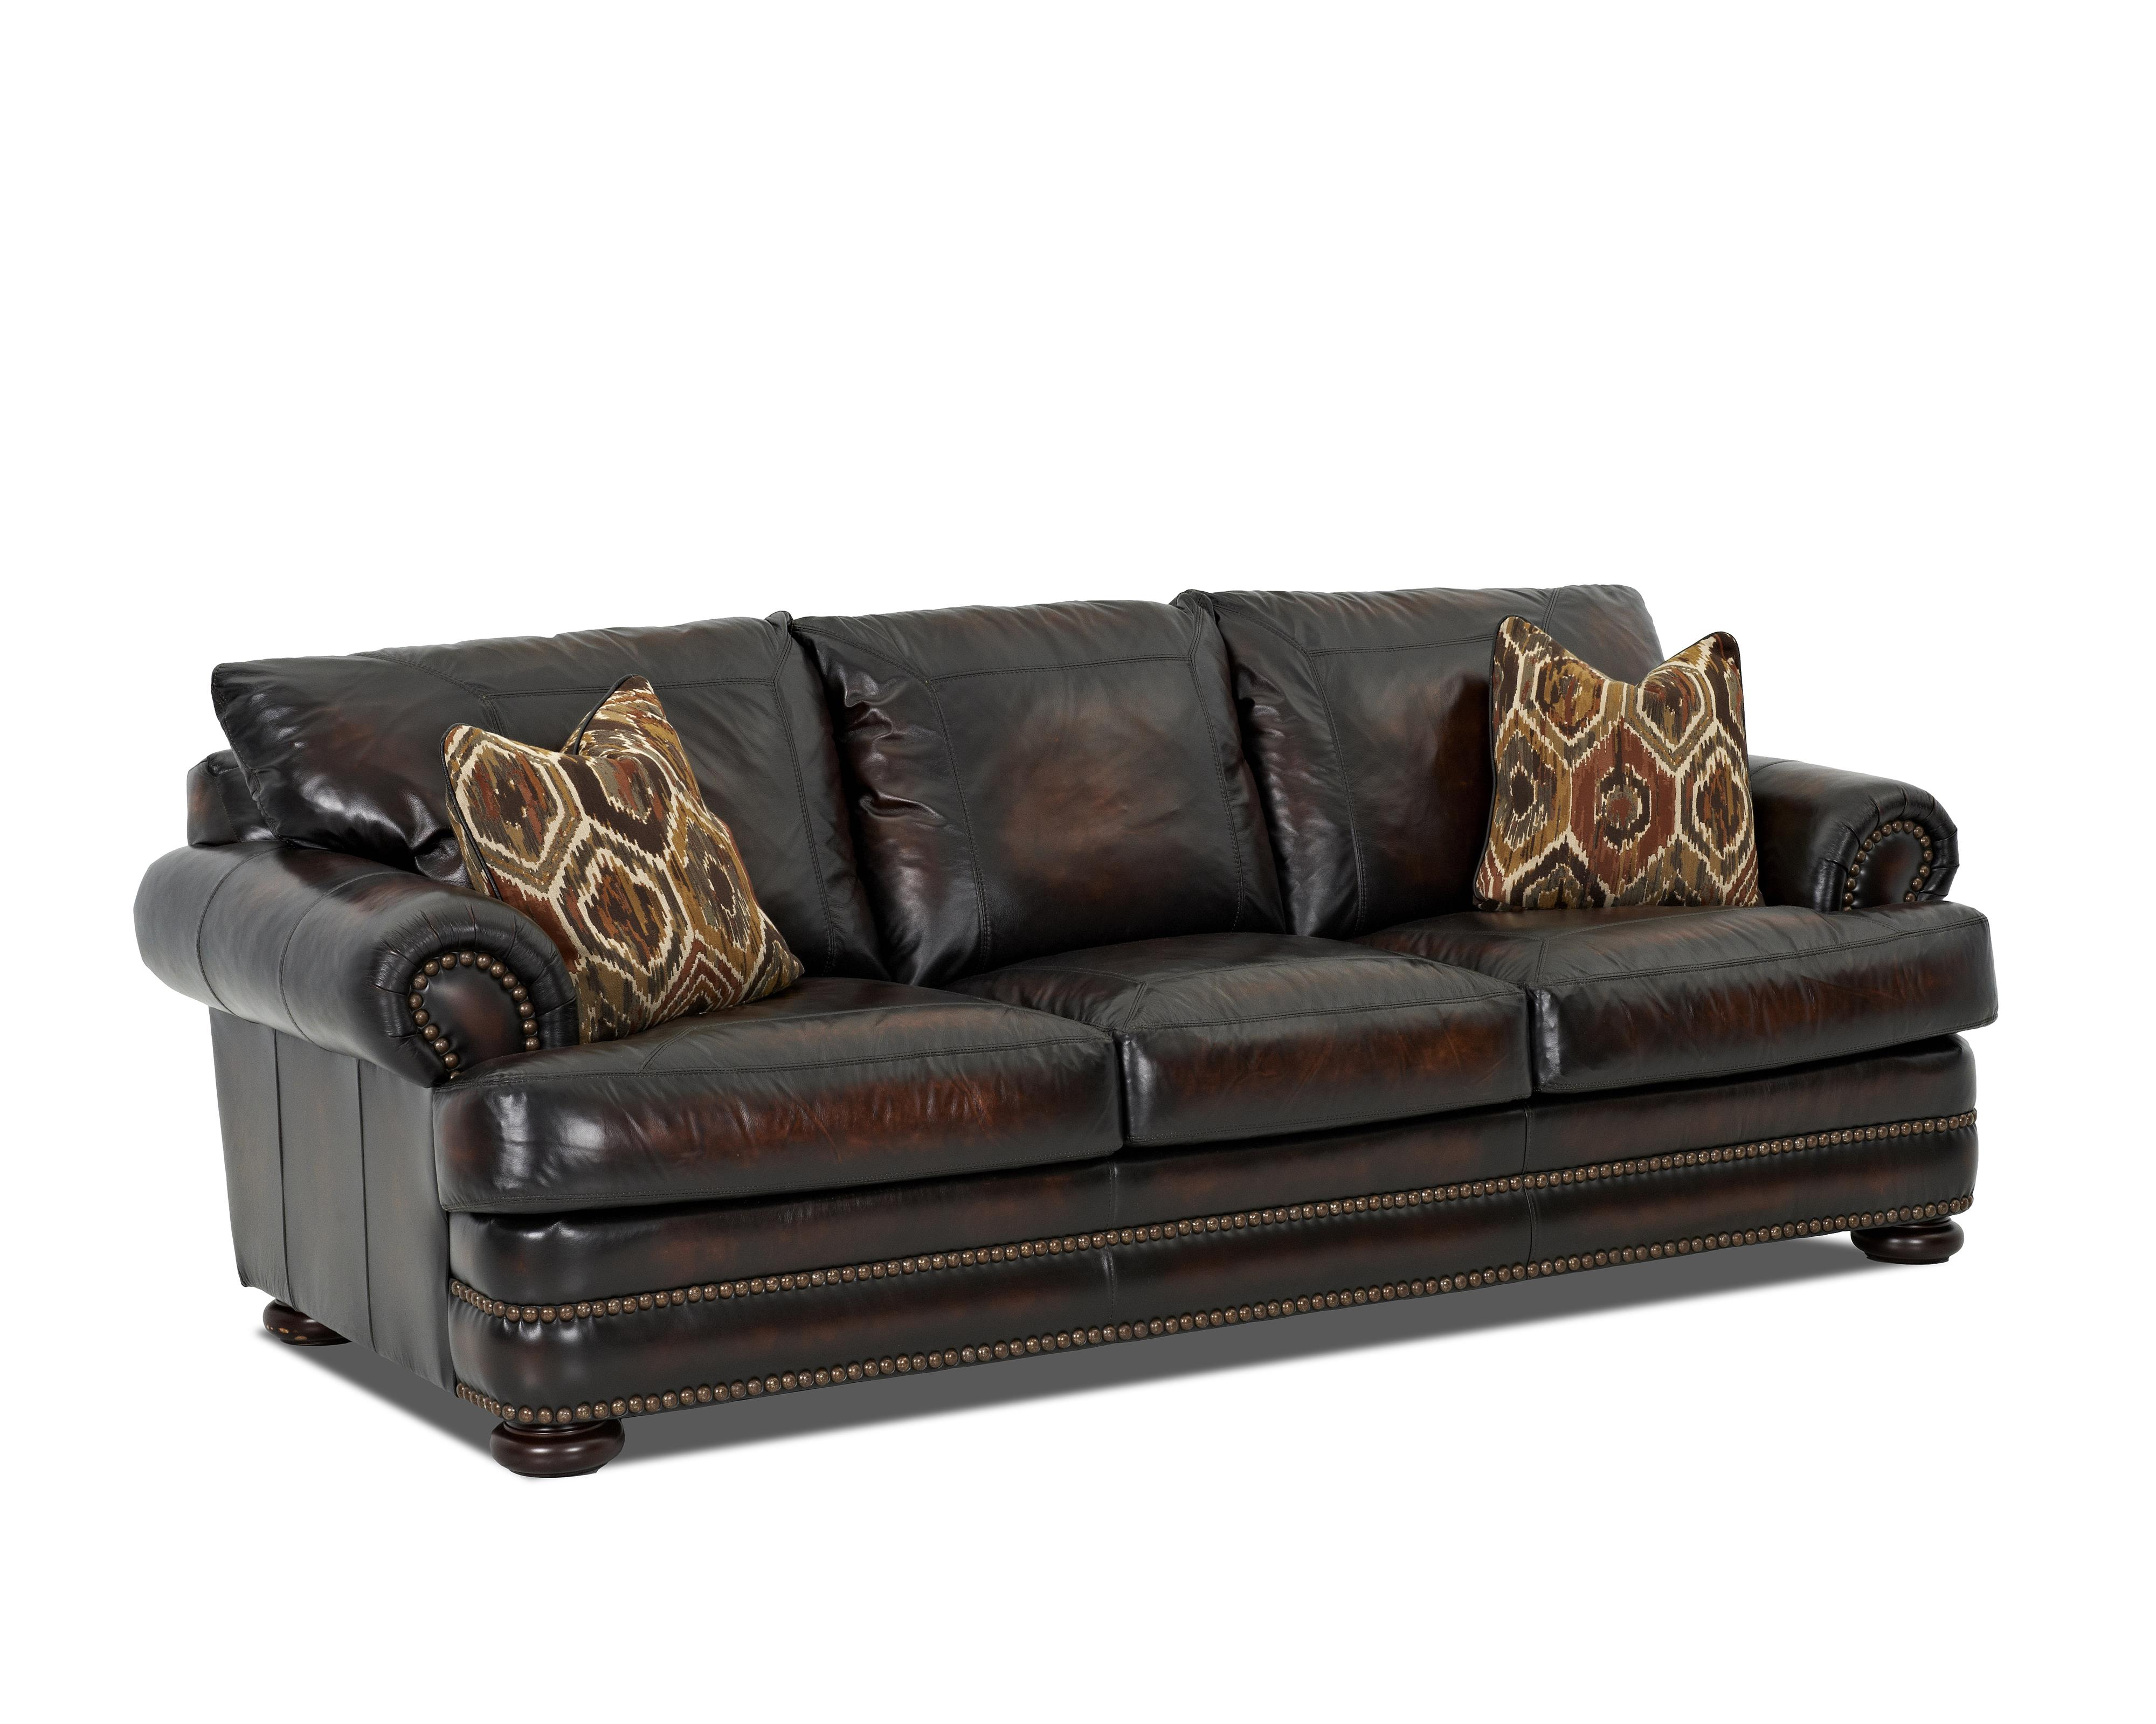 klaussner montezuma ld43800 s leather sofa with rolled With klaussner leather sectional sofa